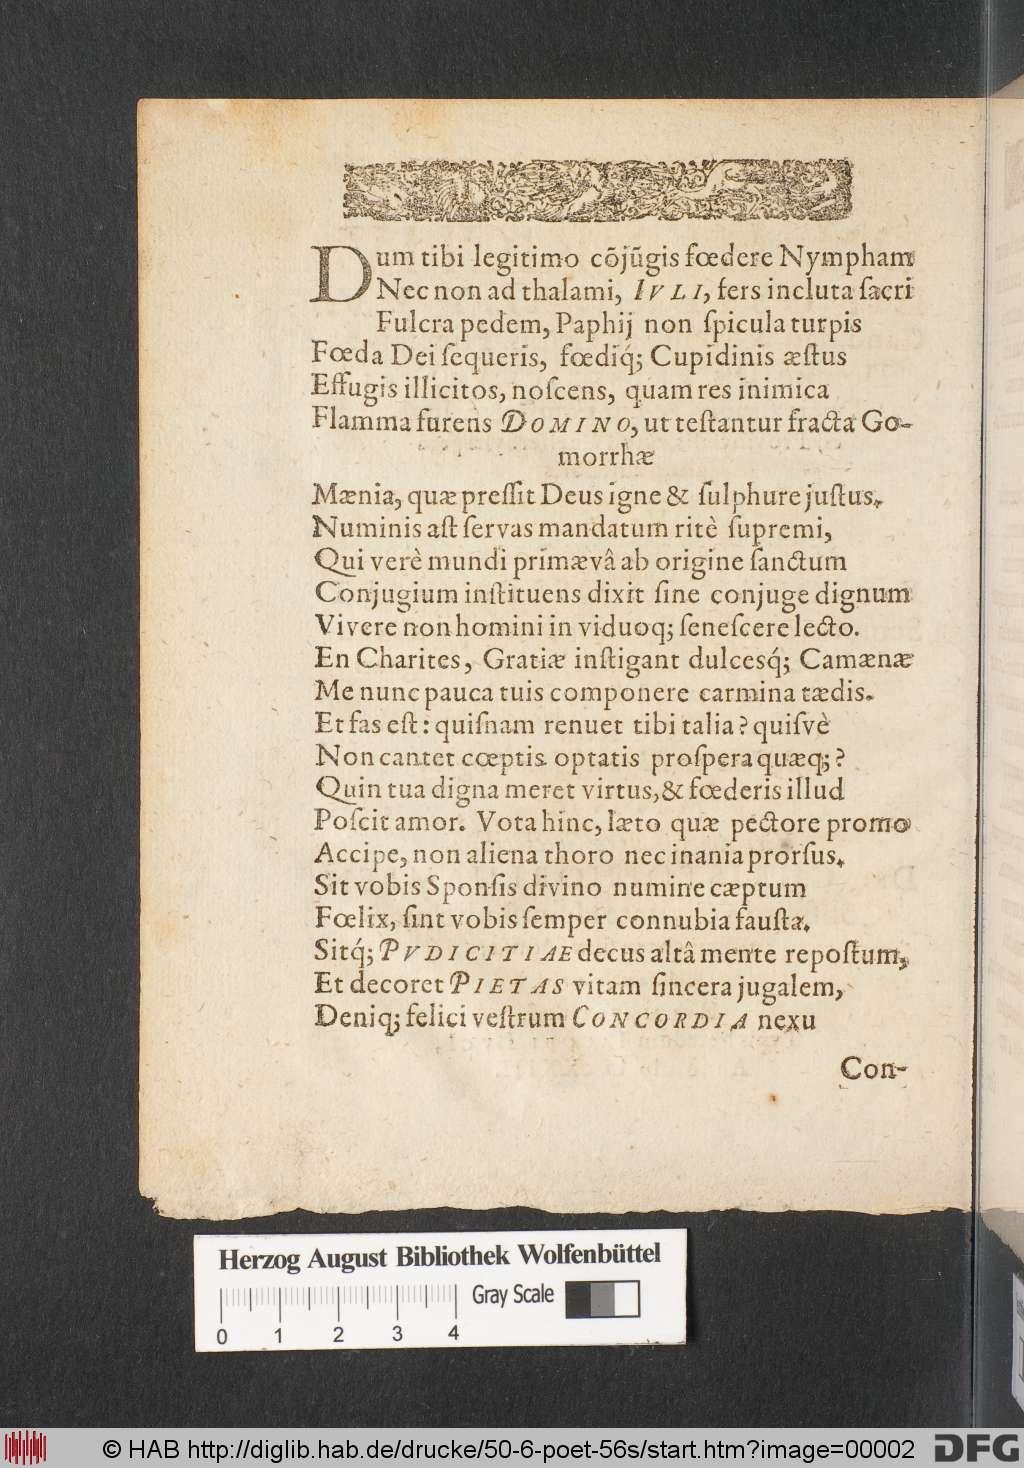 https://diglib.hab.de/drucke/50-6-poet-56s/00002.jpg